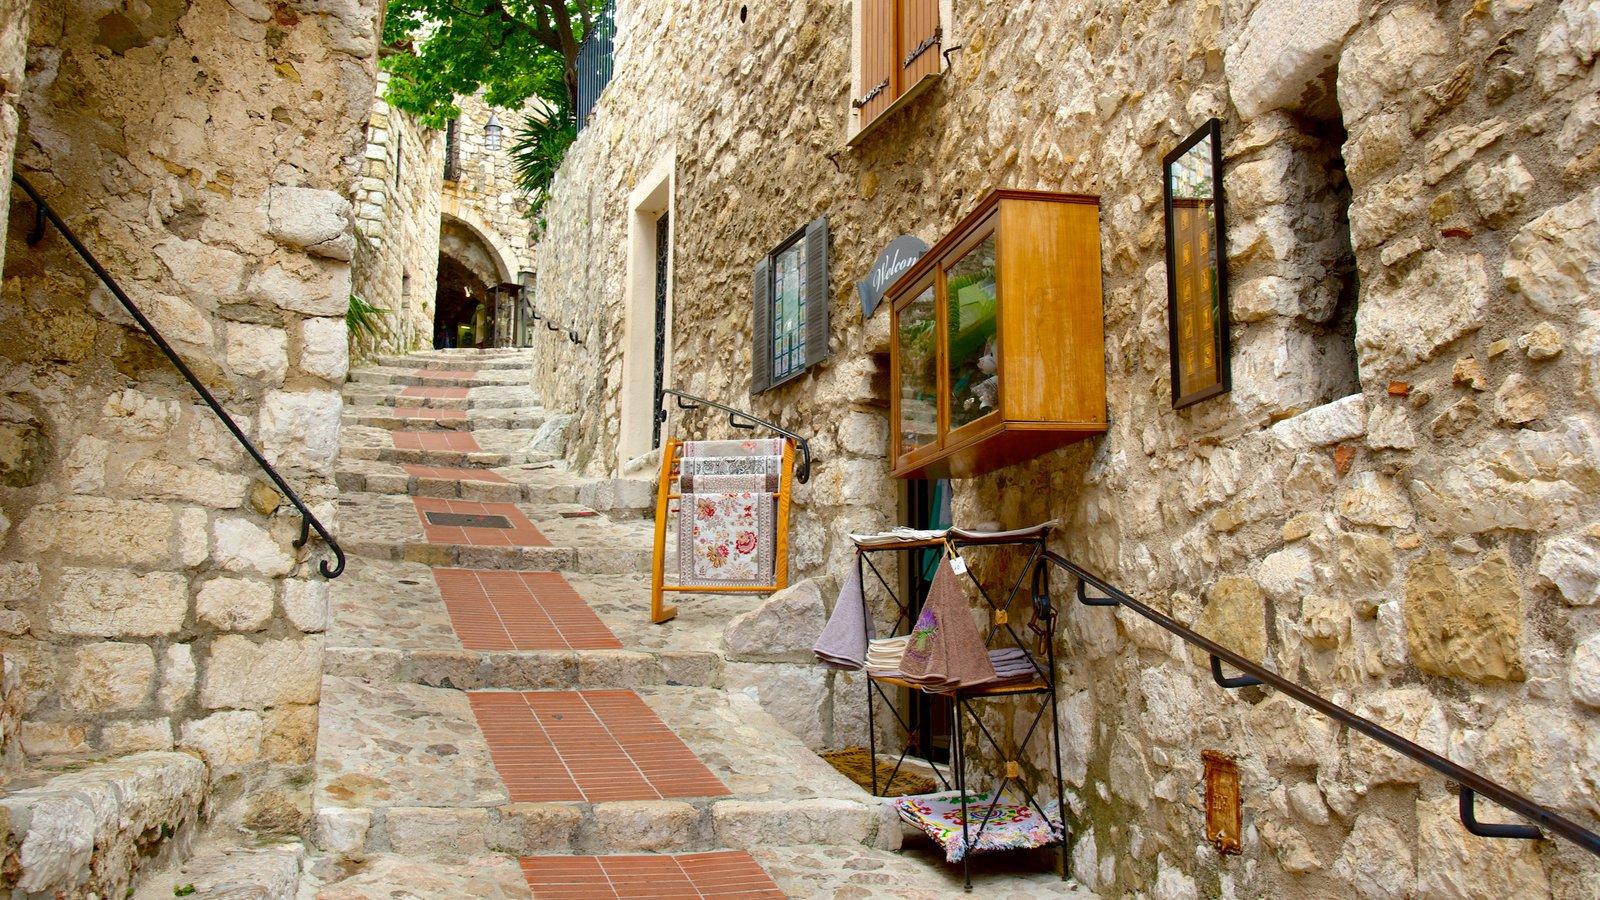 Monaco showing a coastal town